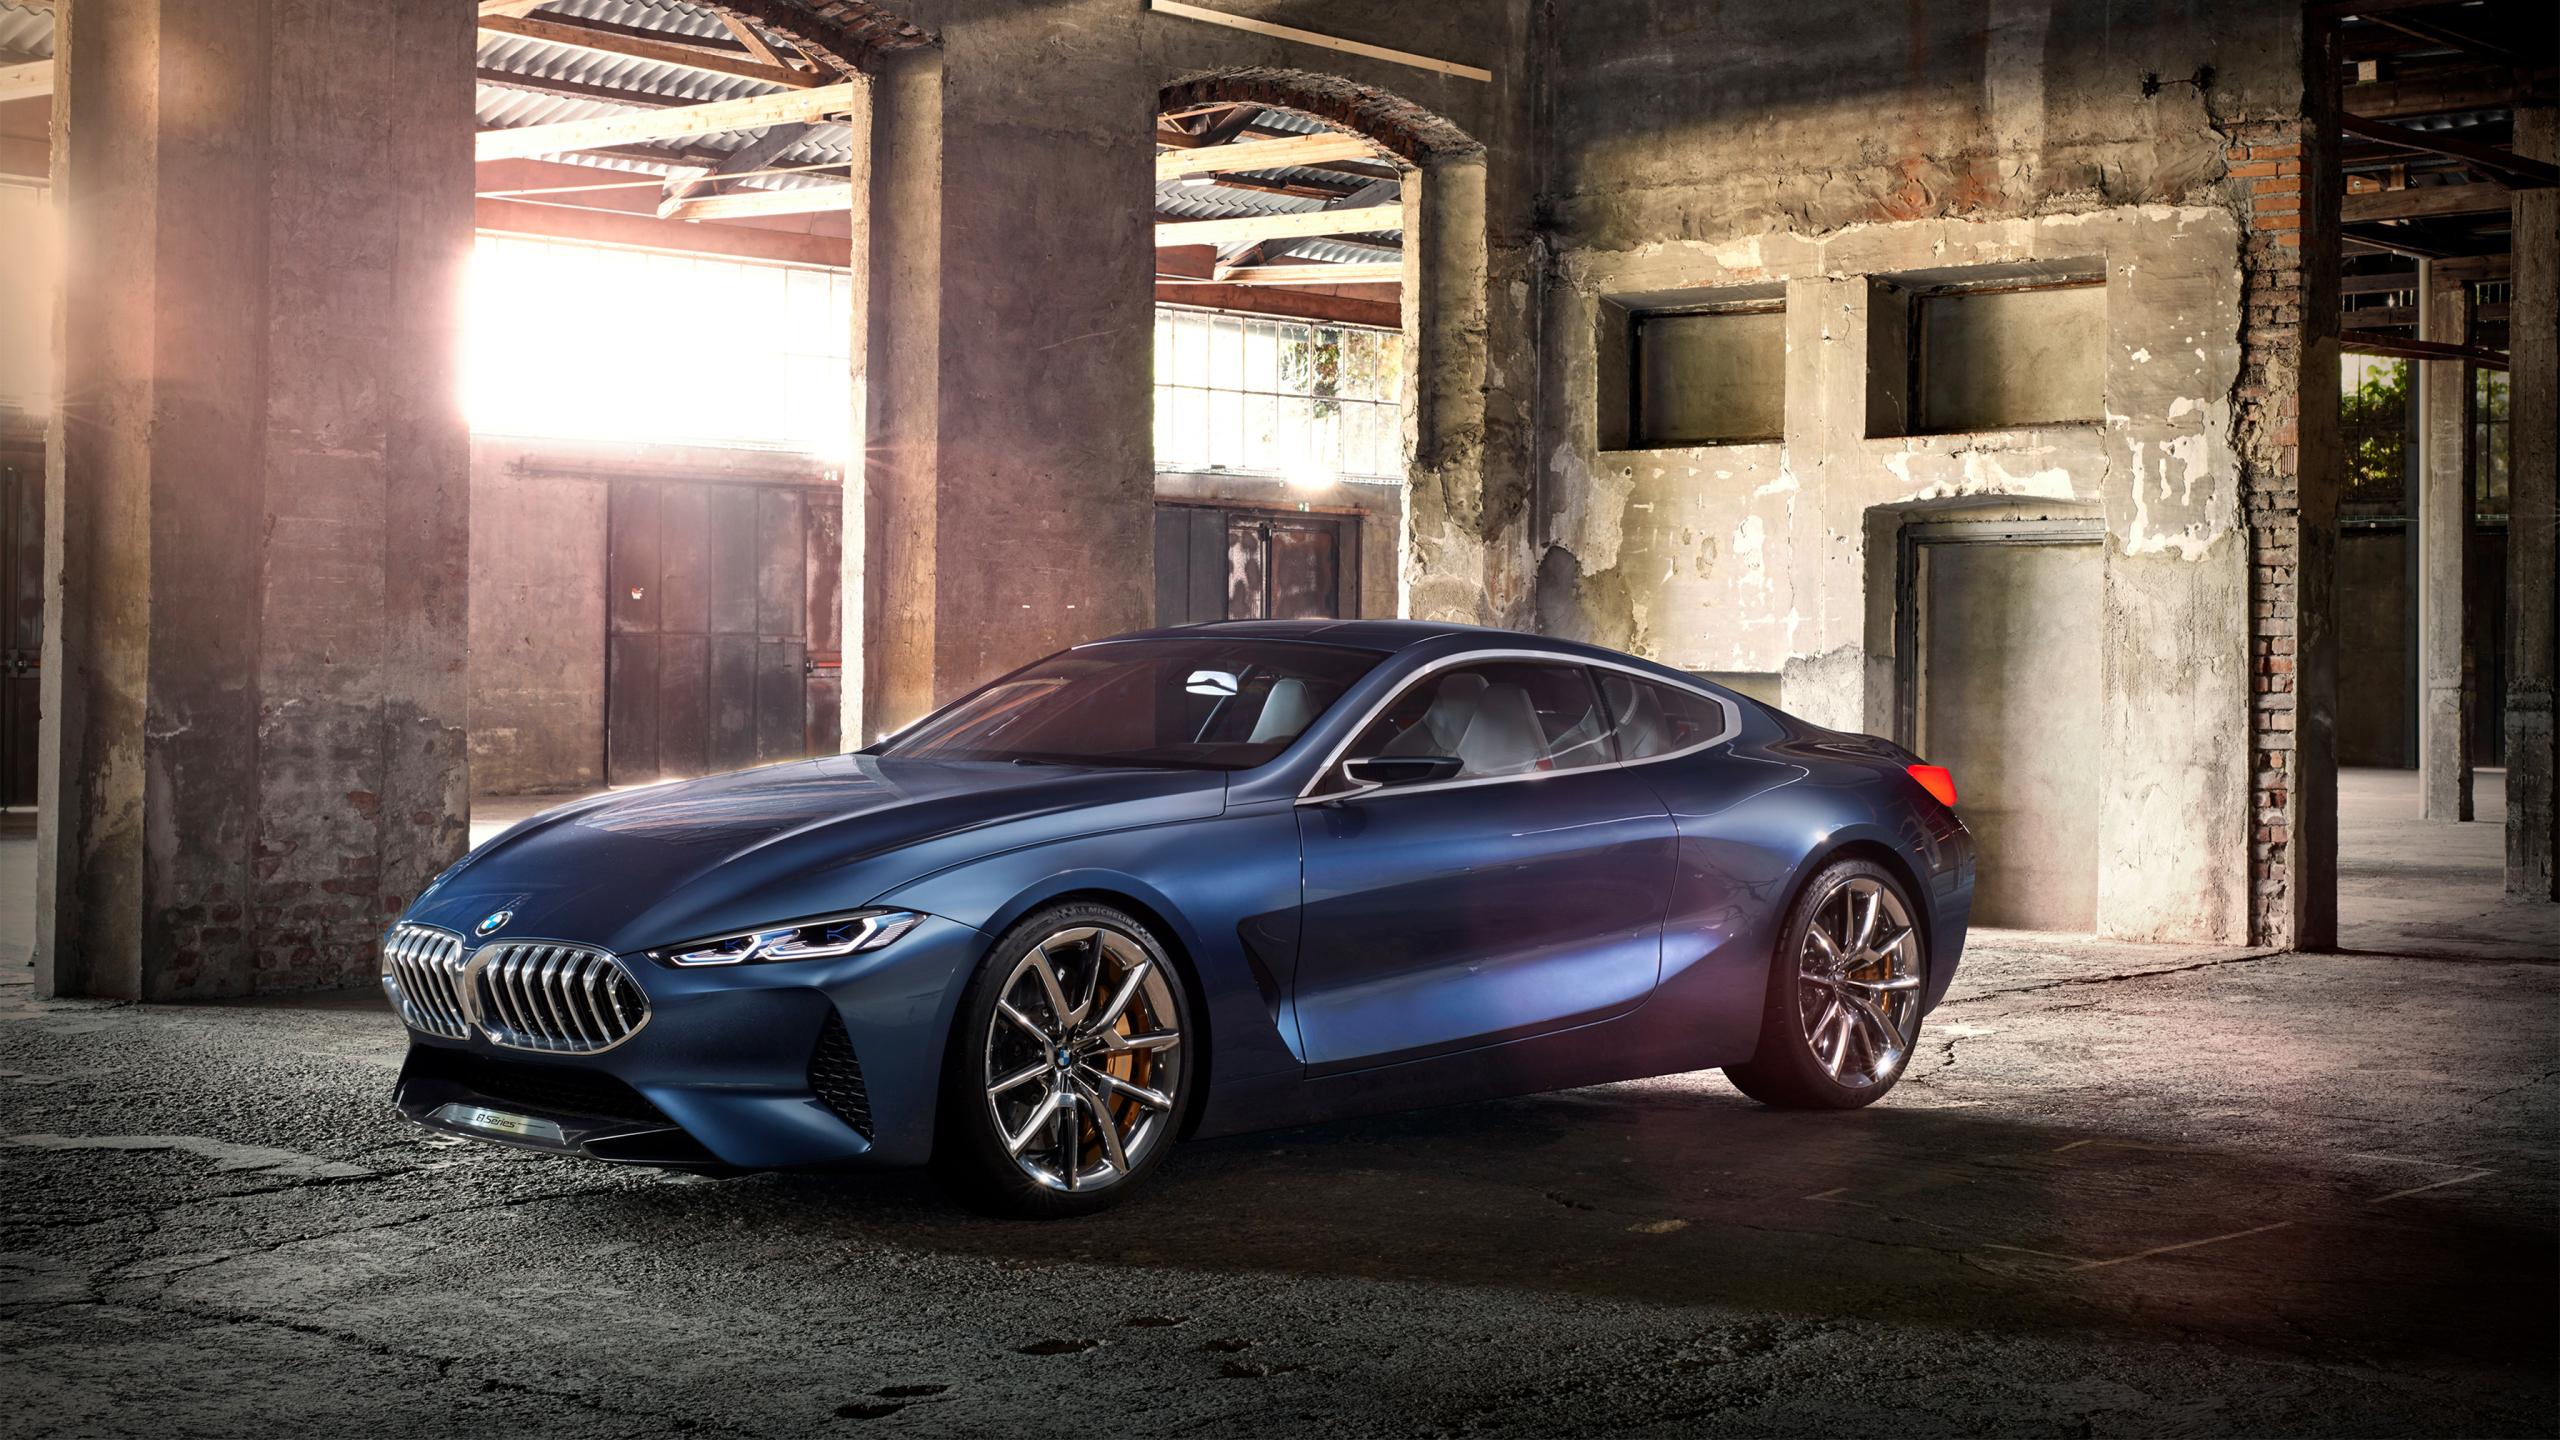 2560x1440 BMW Concept 8 Series 1440P Resolution Wallpaper ...